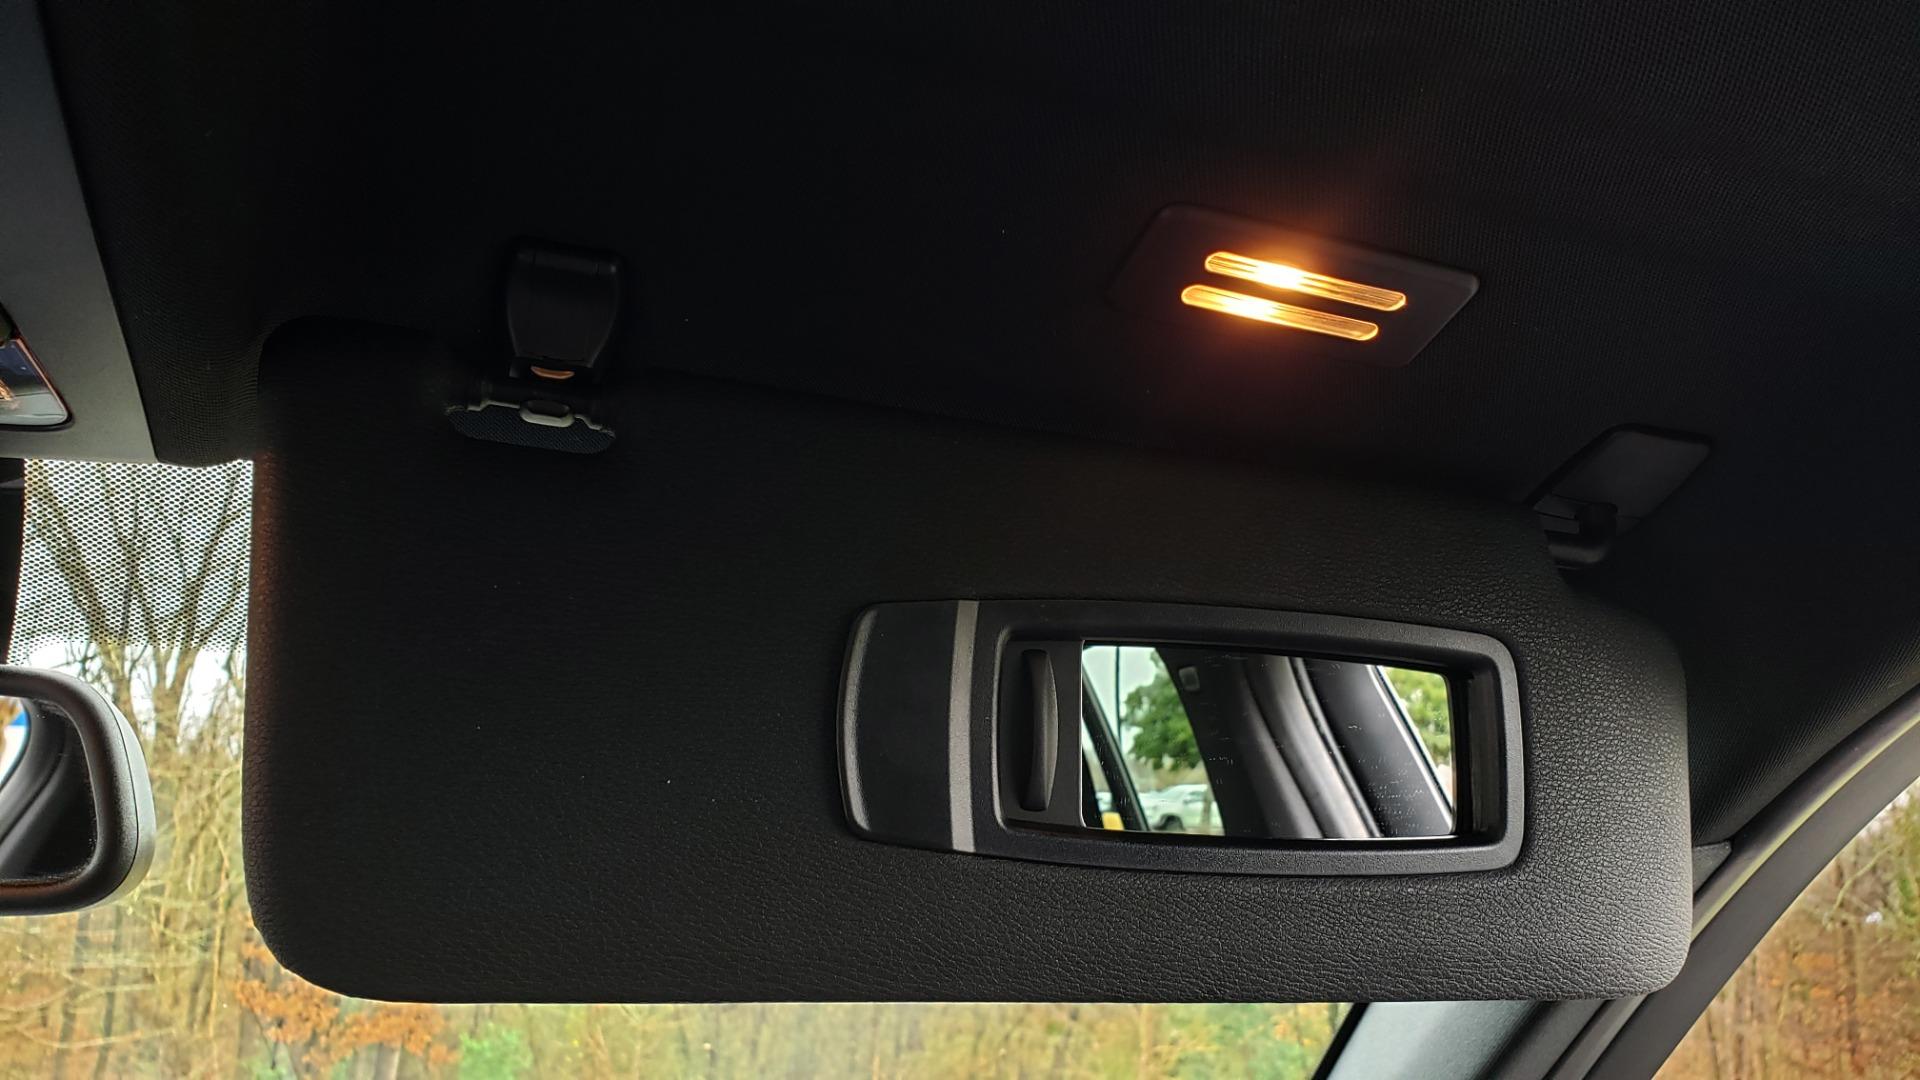 Used 2017 BMW X3 XDRIVE35I M-SPORT / DRVR ASST PLUS / TECHNOLOGY / HUD / BLIND SPOT for sale Sold at Formula Imports in Charlotte NC 28227 52